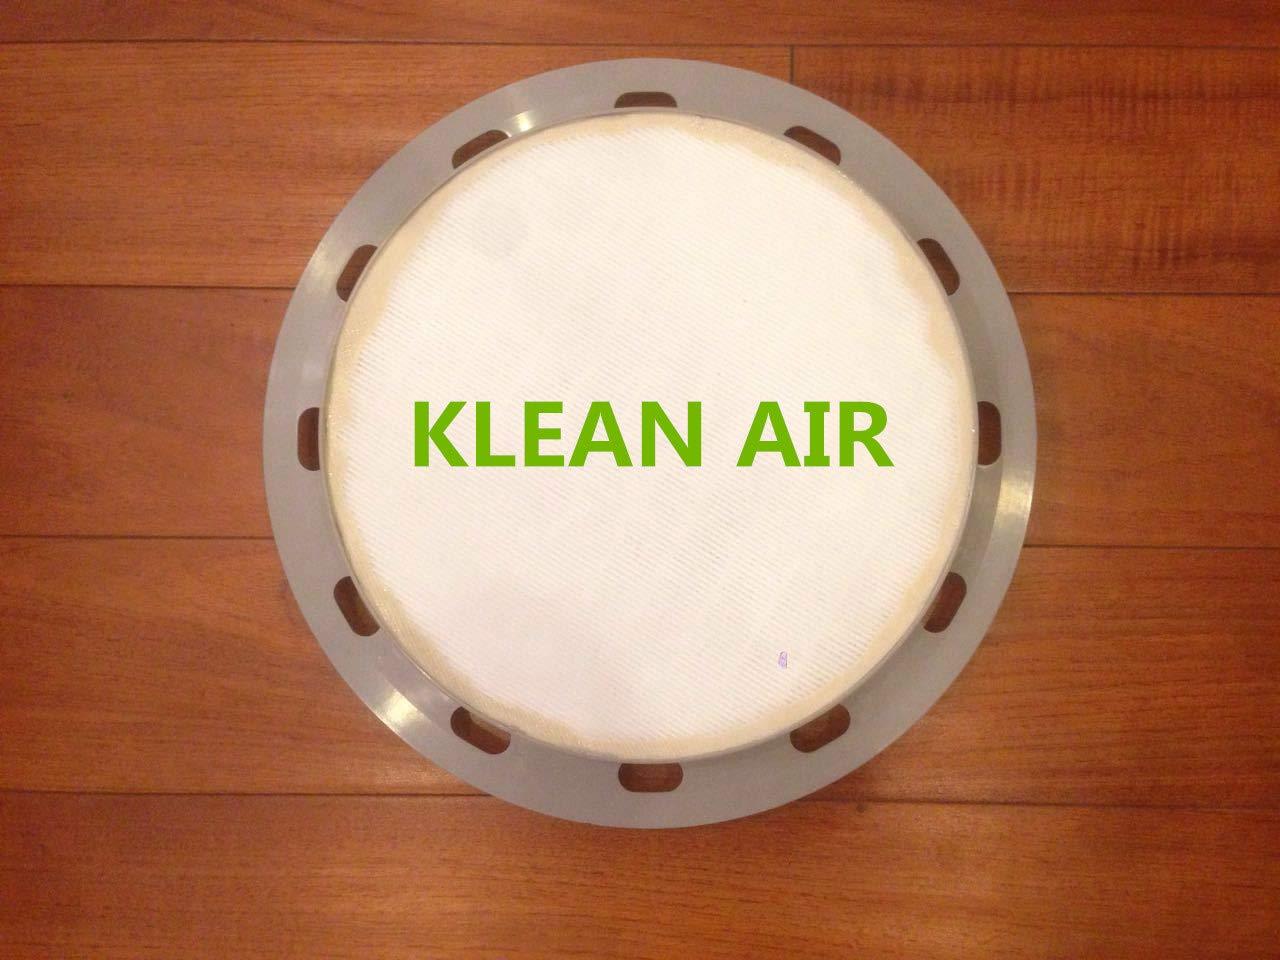 Pullman Holt HEPA filter fits PV930/Euroclean GD930/Nilfisk GD930-1PCS/PK-NEW!! by KLEAN AIR